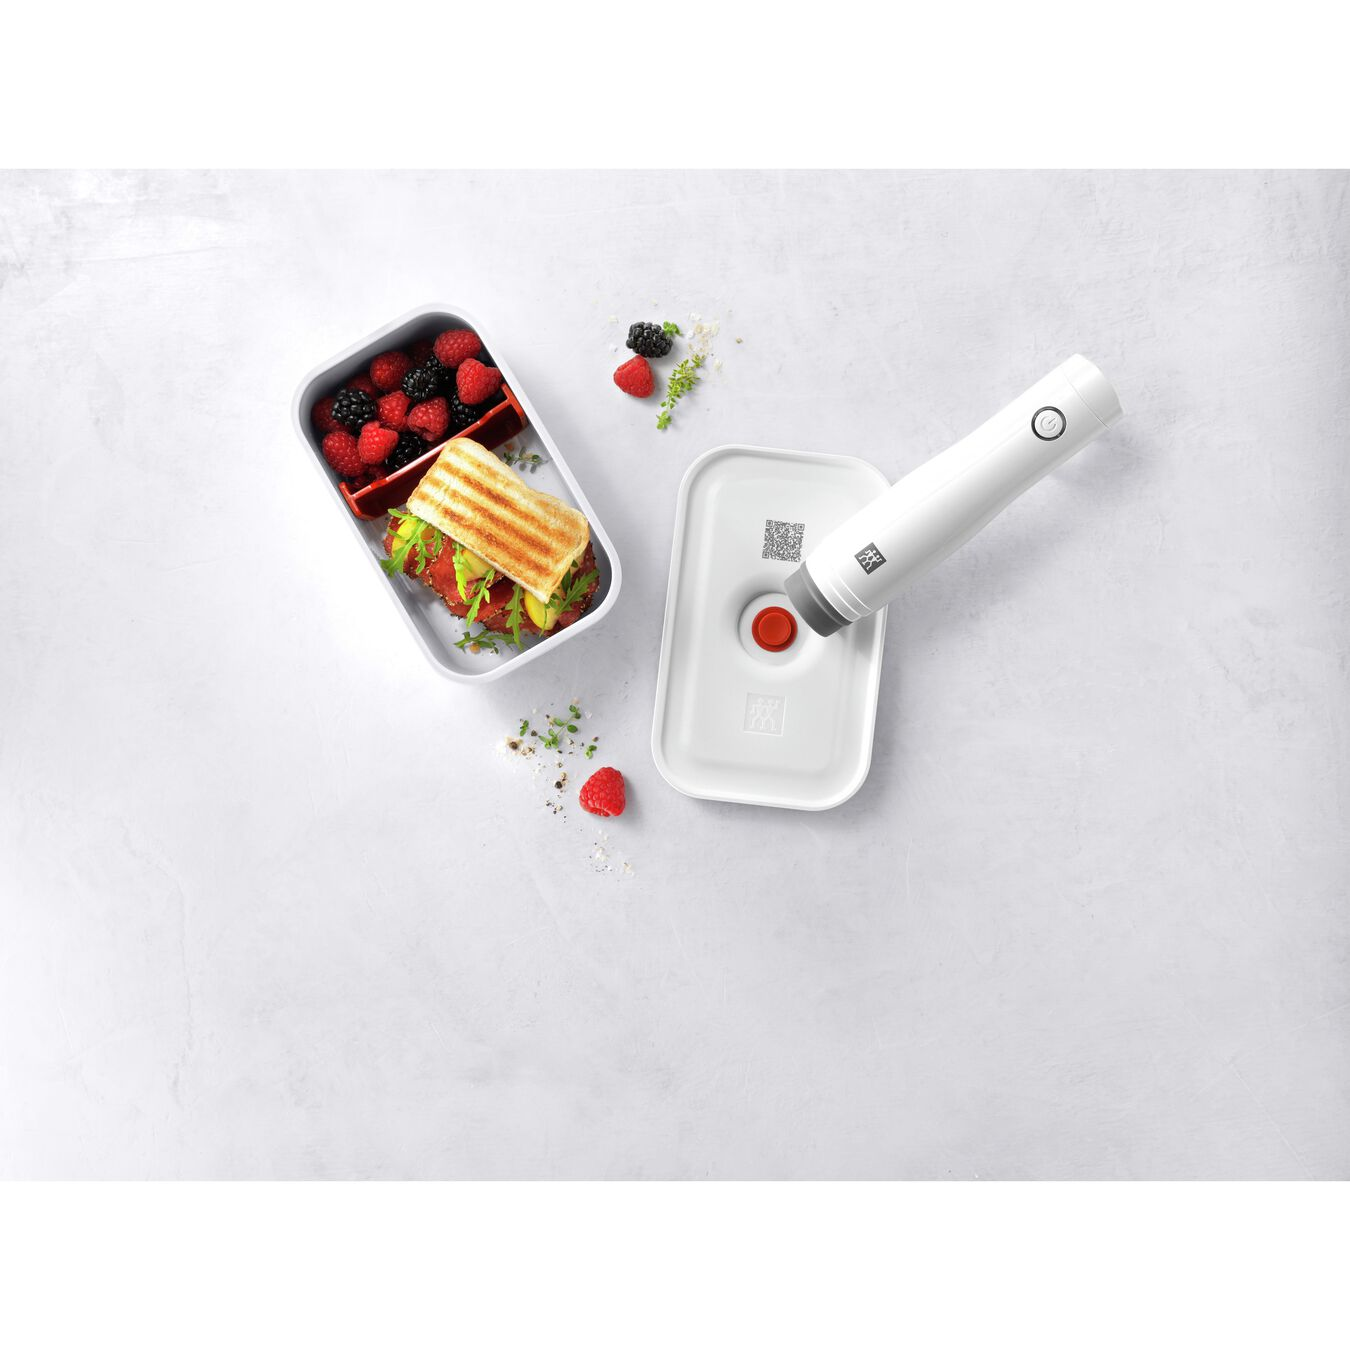 Vakuum Lunchbox, M, Kunststoff, Weiß-Rot,,large 5